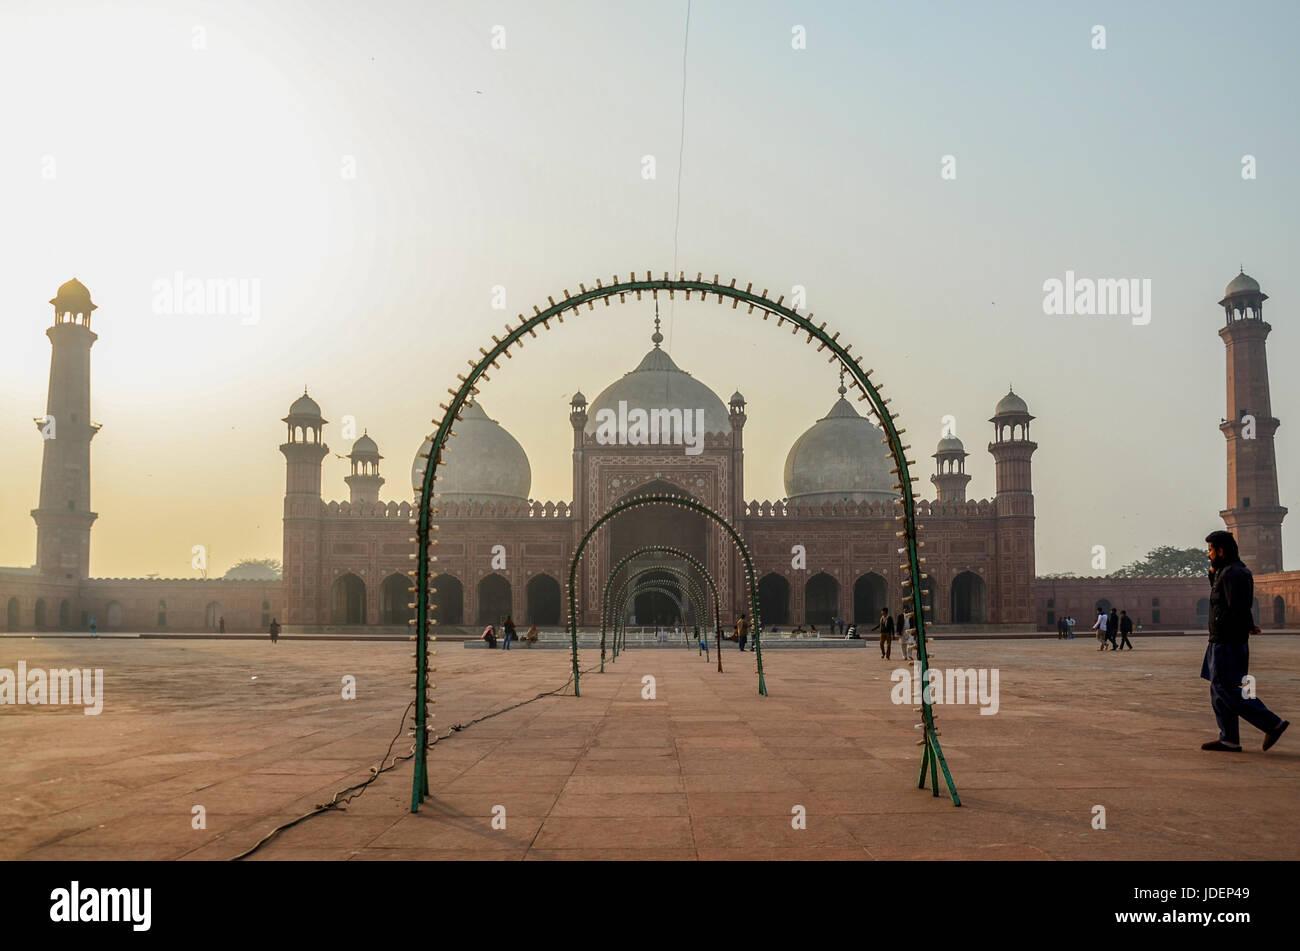 Badshahi Mosque, Lahore, Pakistan - Stock Image